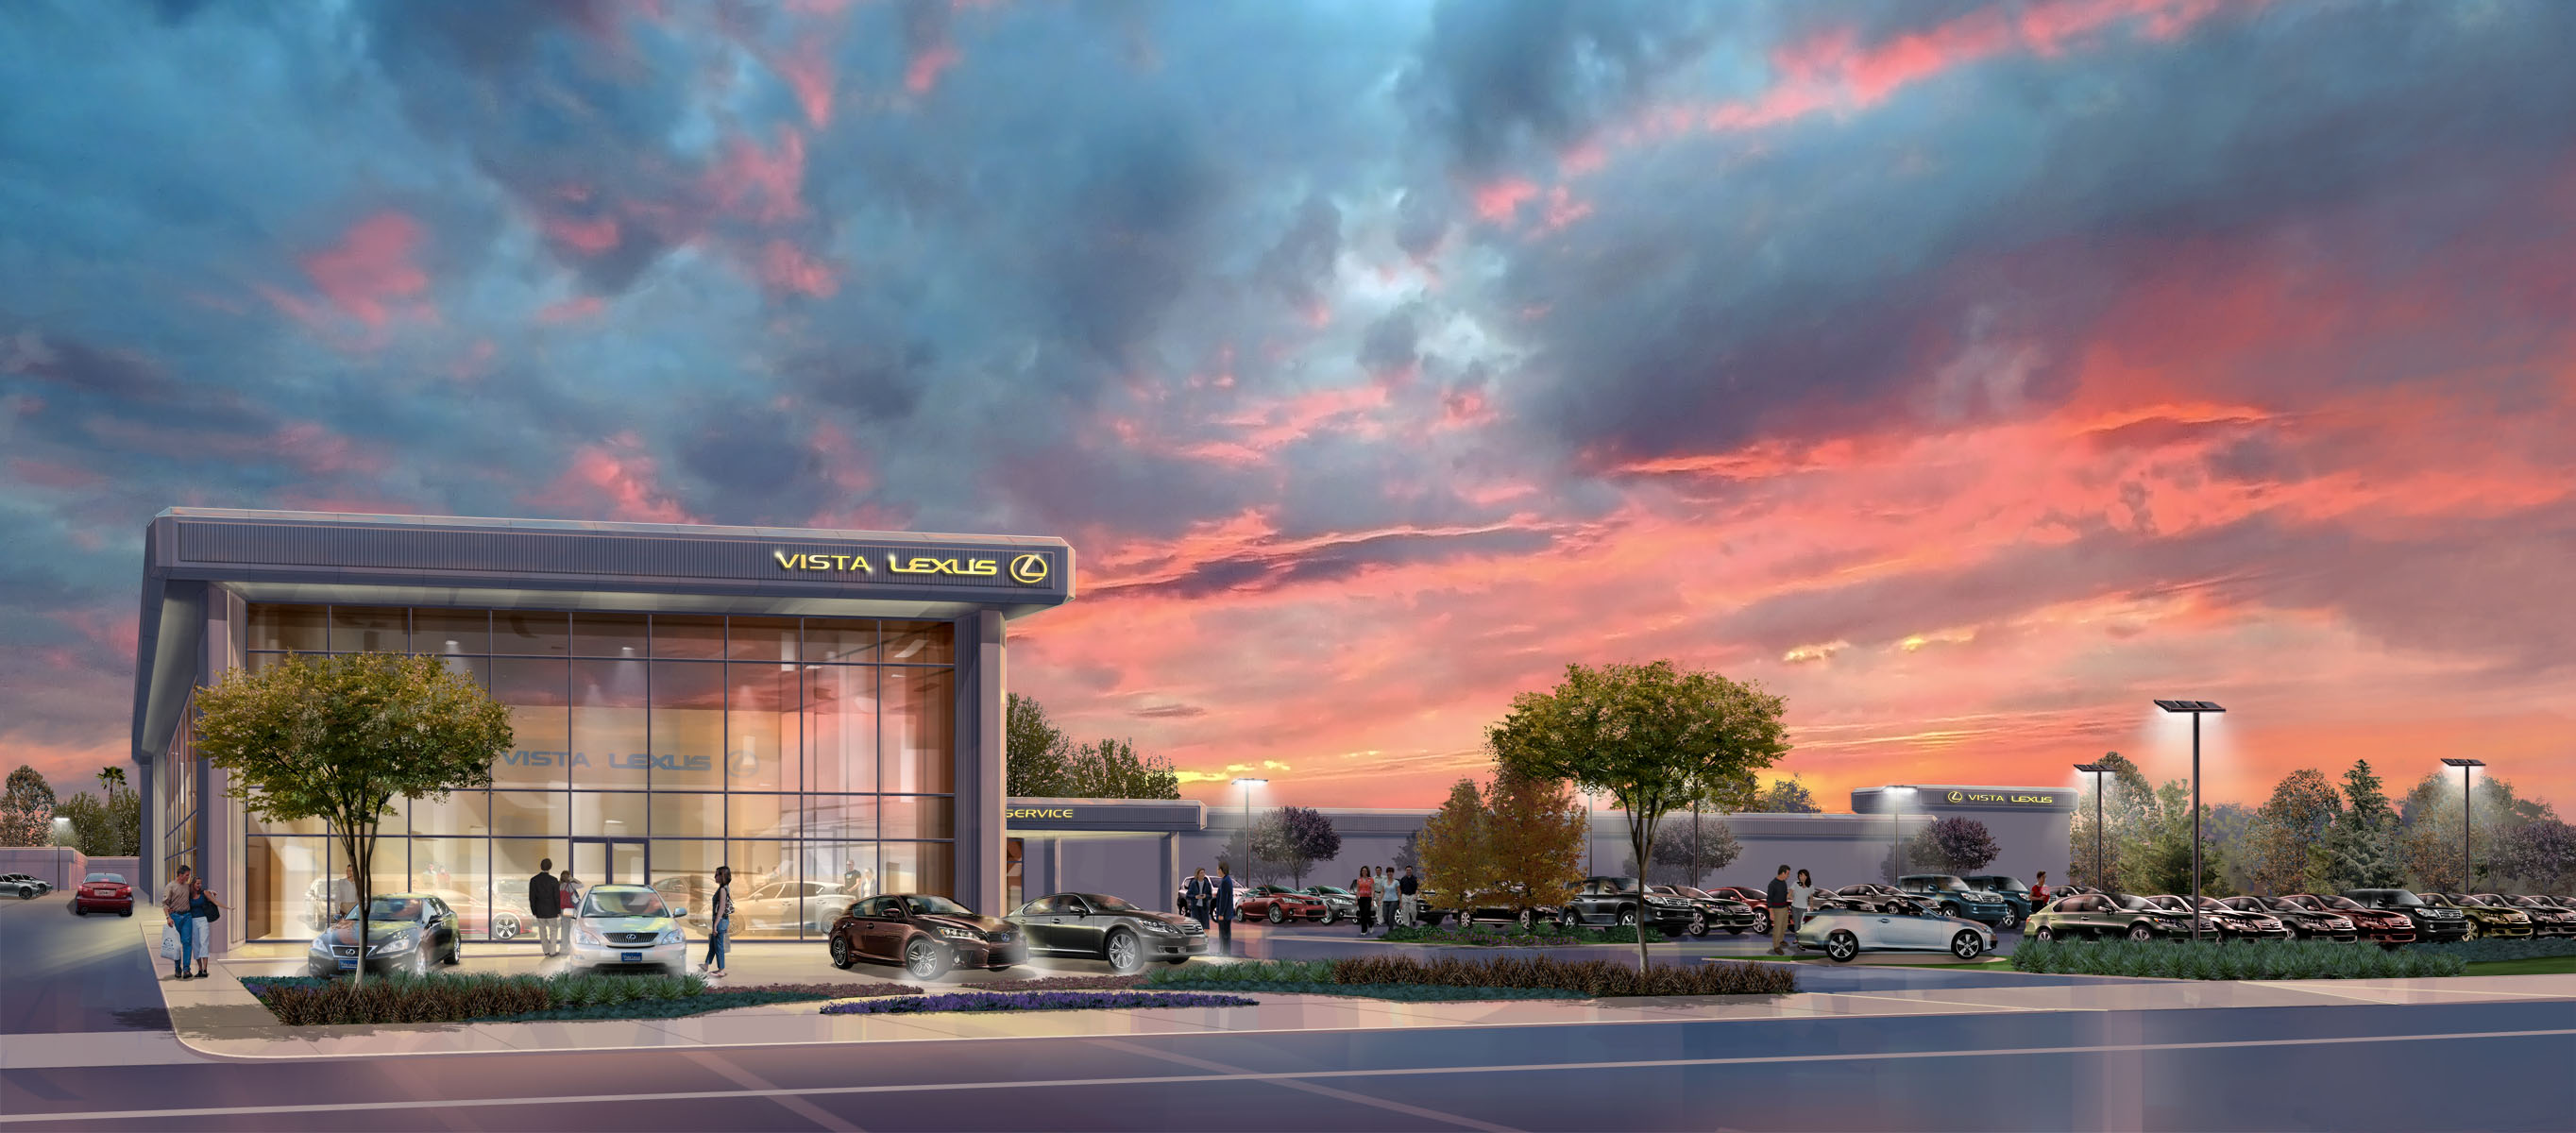 Vista Lexus Woodland Hills, CA